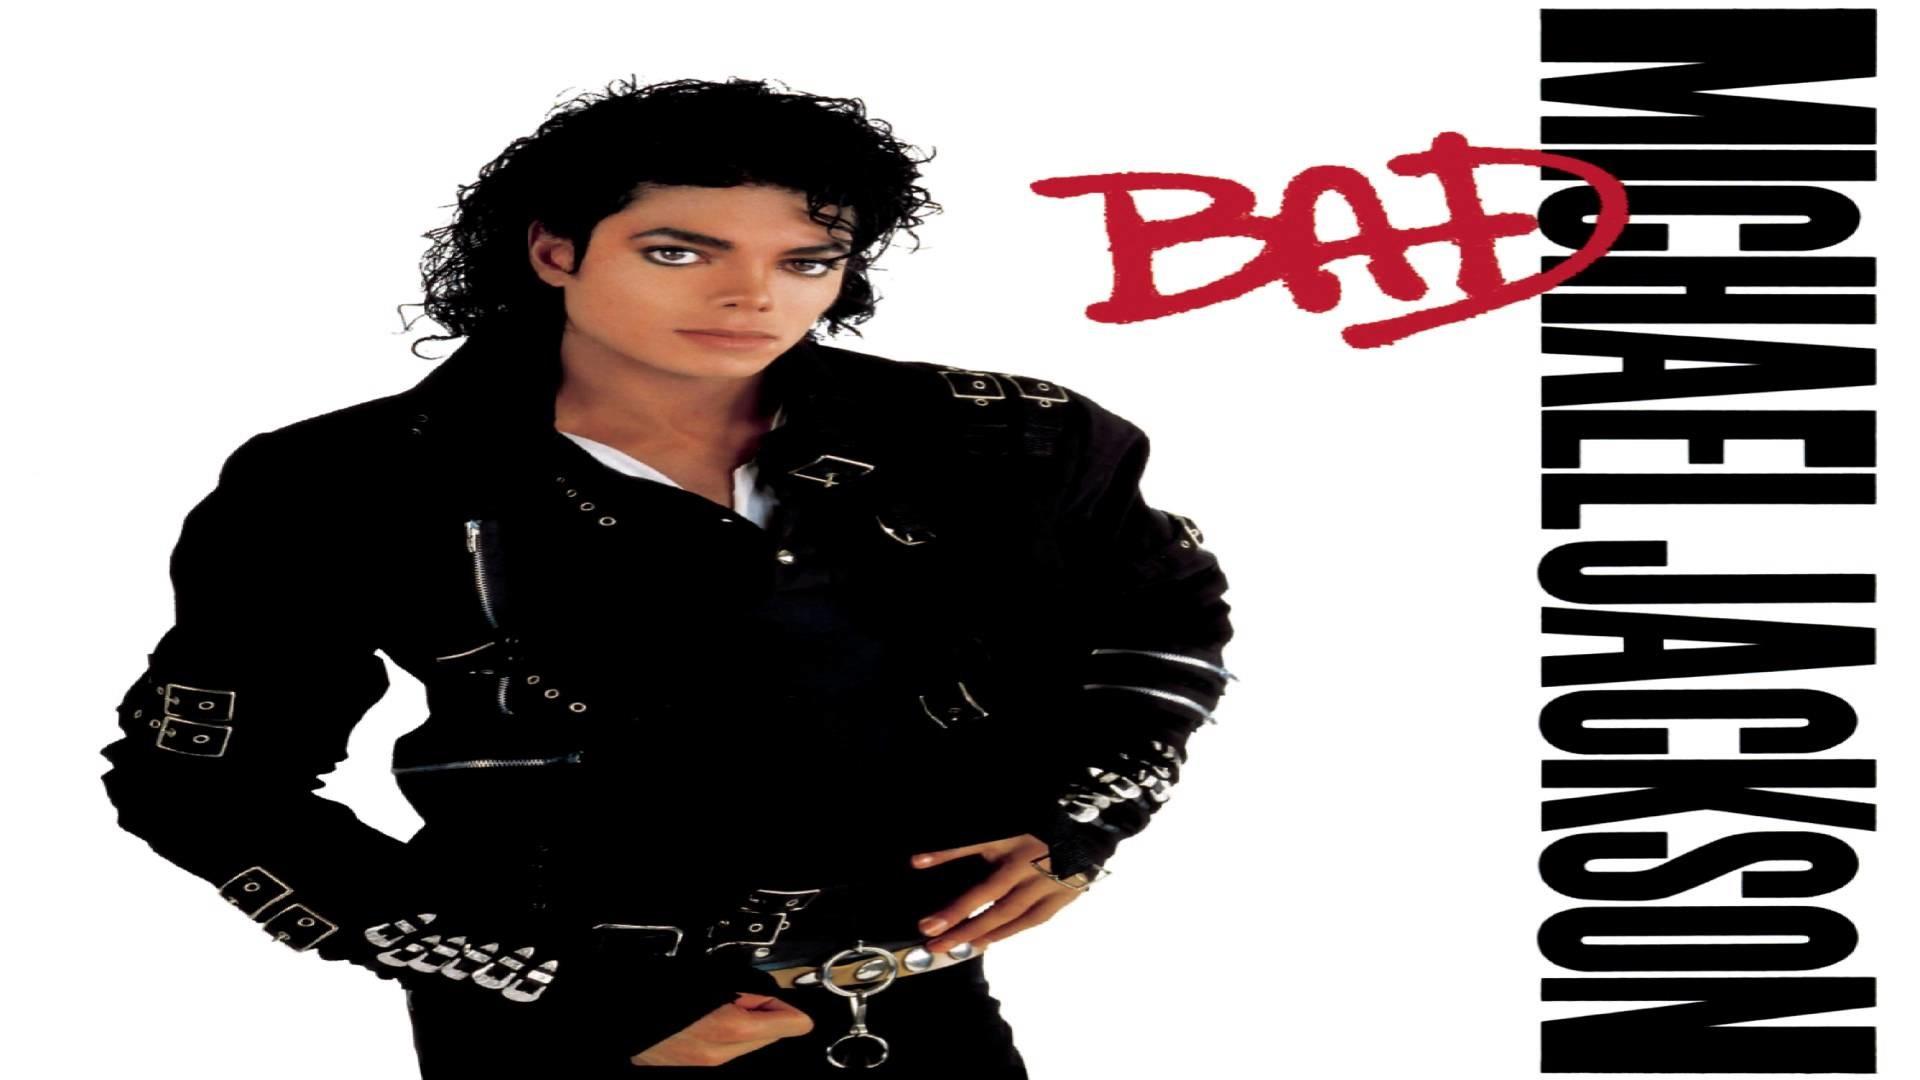 Michael Jackson Bad Wallpaper